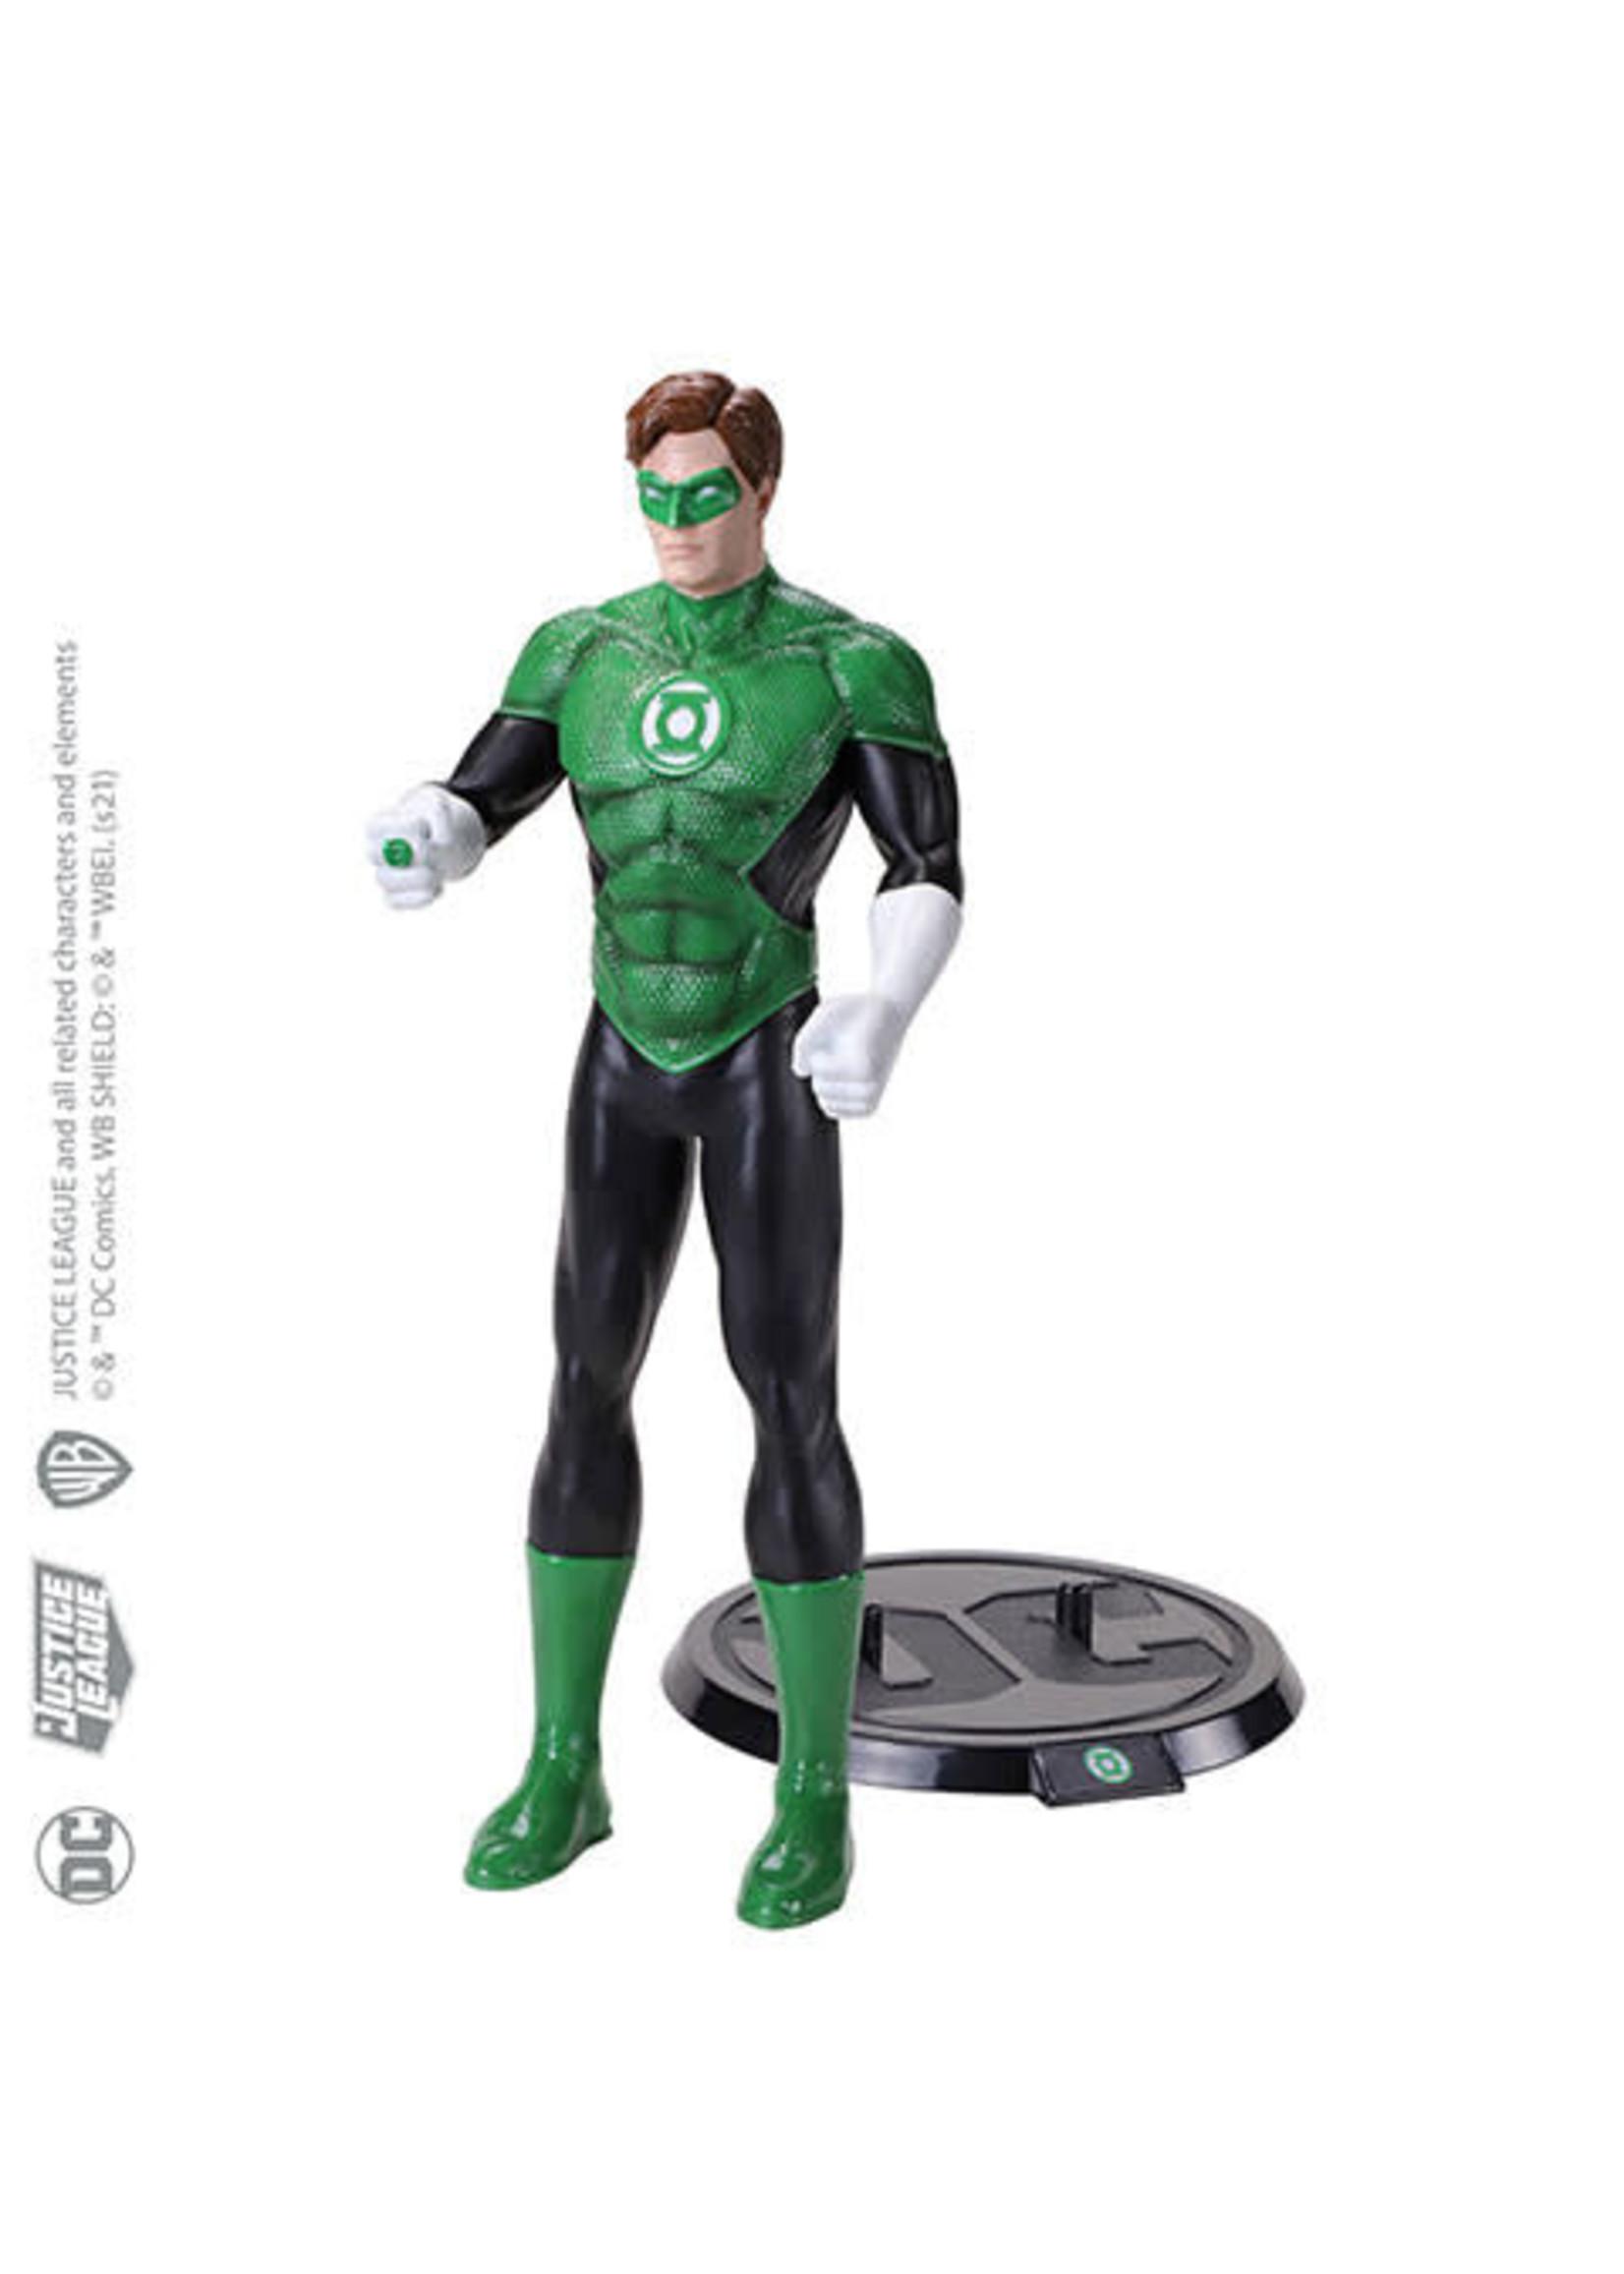 DC COMICS BENDYFIGS GREEN LANTERN